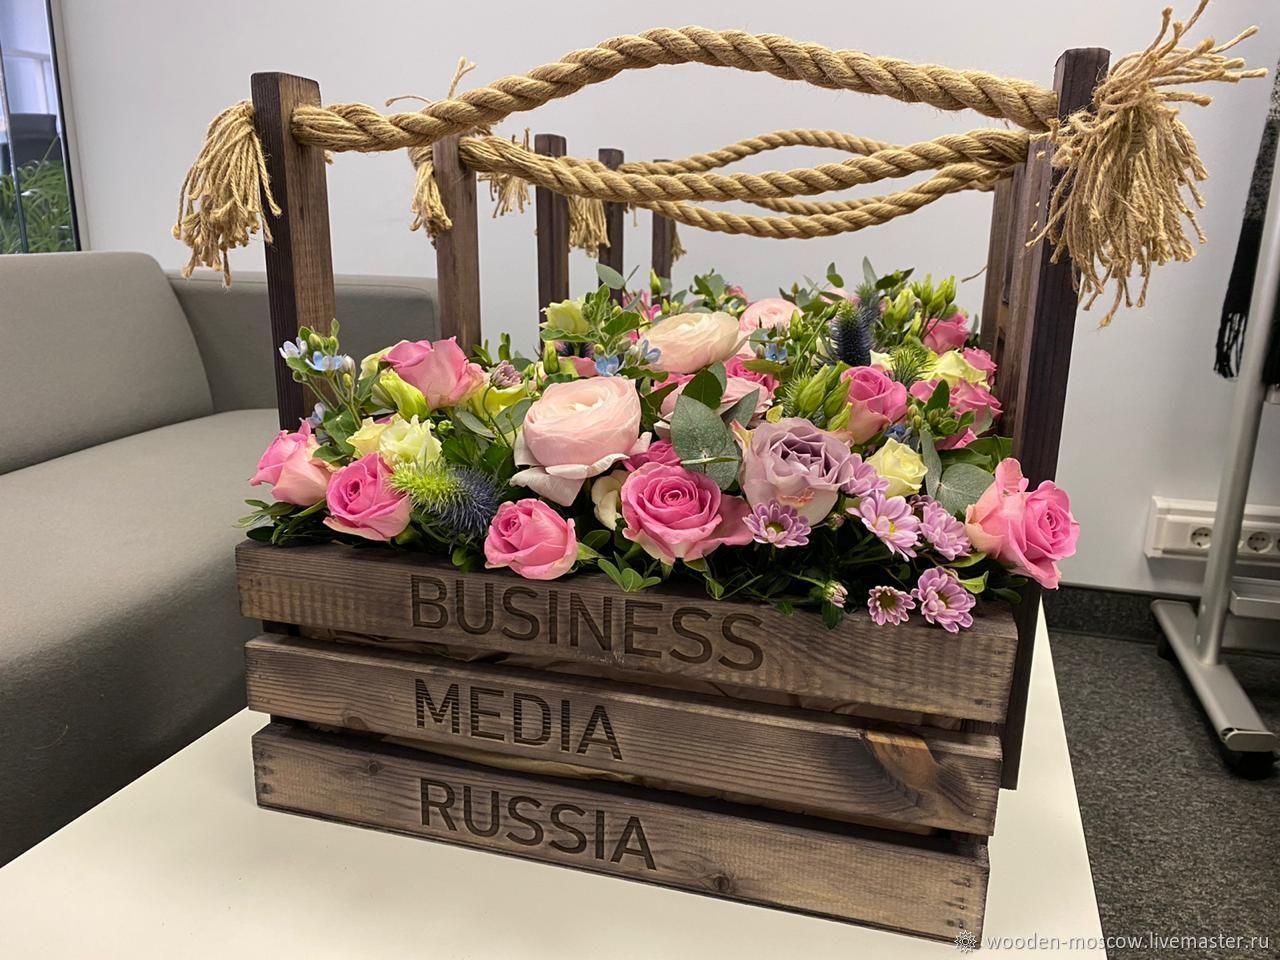 Подарочная упаковка - ящики из дерева, Ящики, Москва,  Фото №1